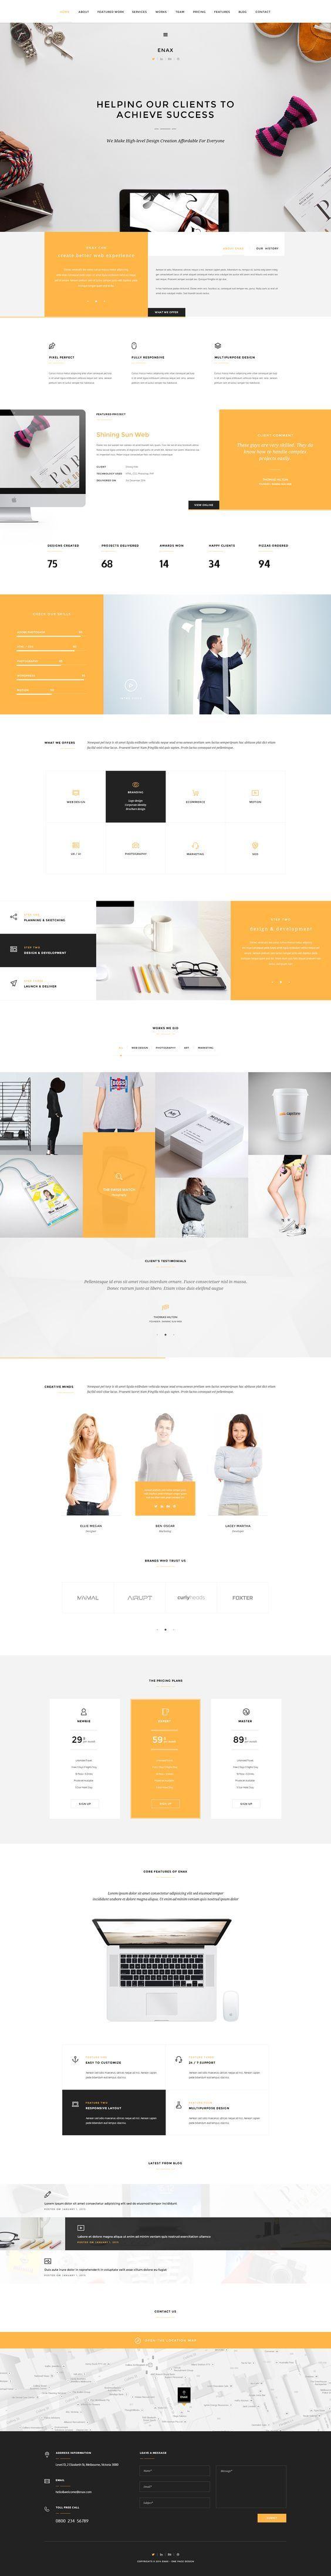 #webdesign #design #theme: